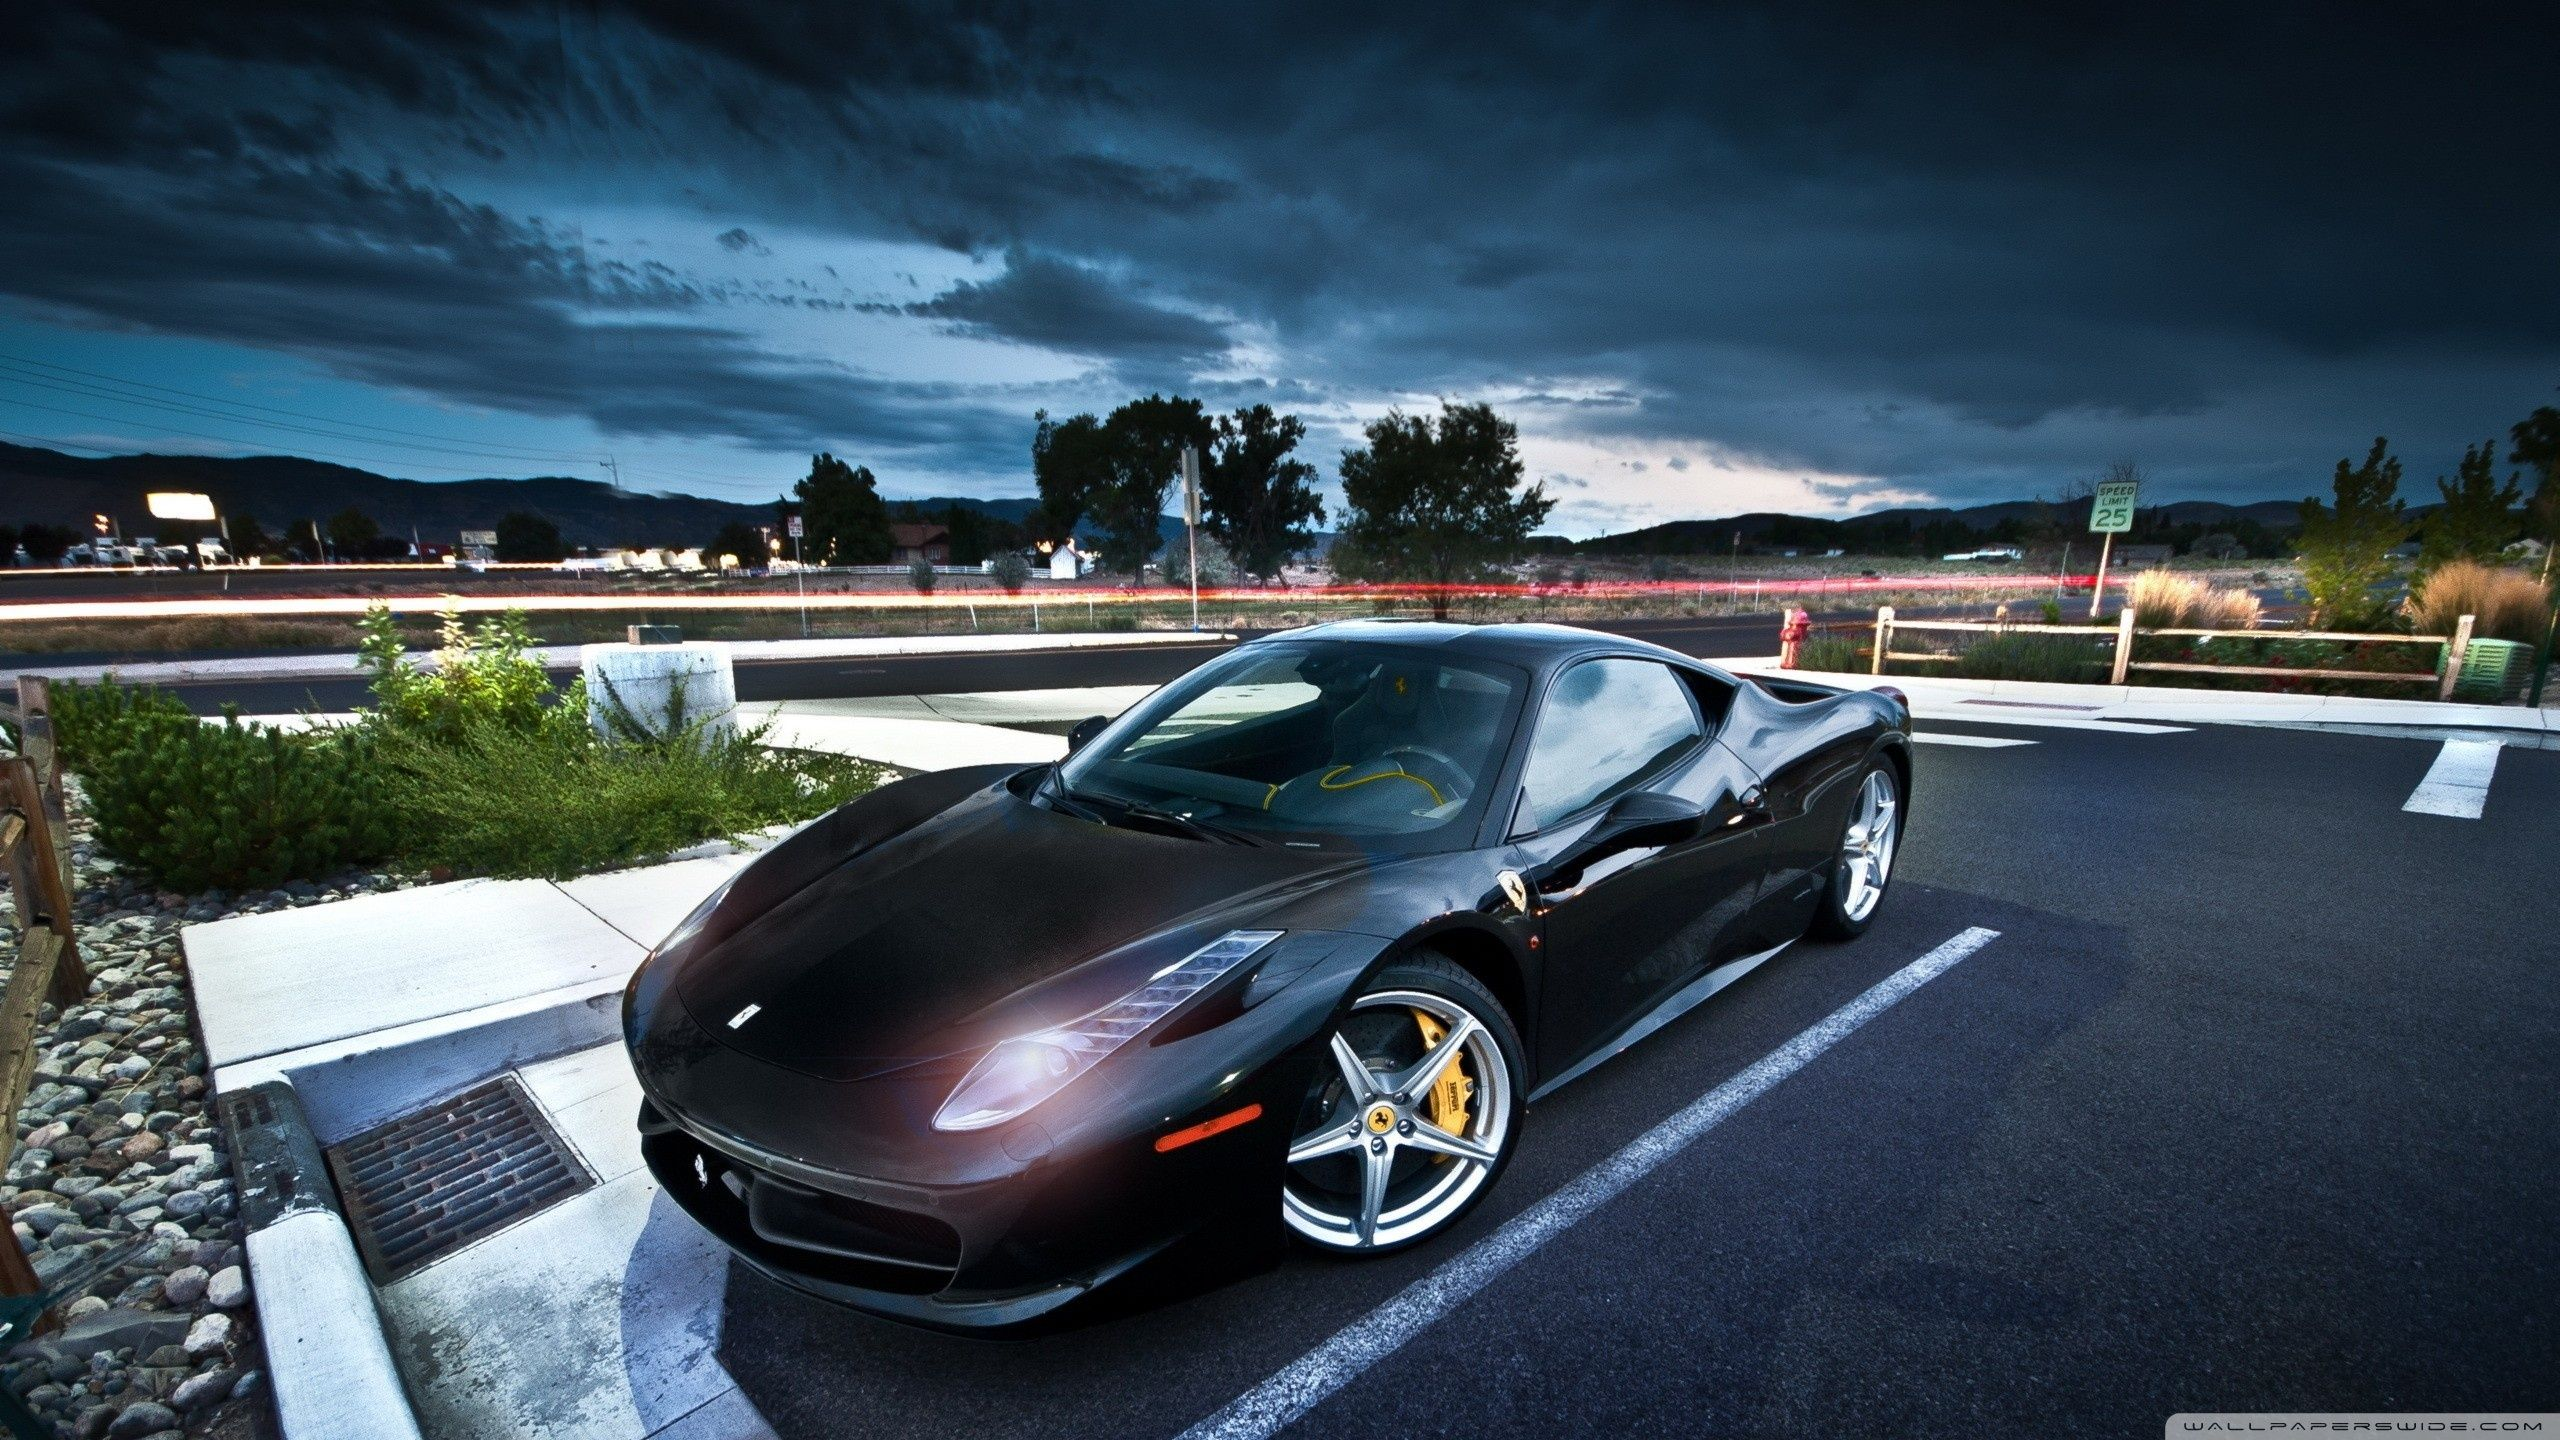 Black Ferrari Wallpapers Top Free Black Ferrari Backgrounds Wallpaperaccess